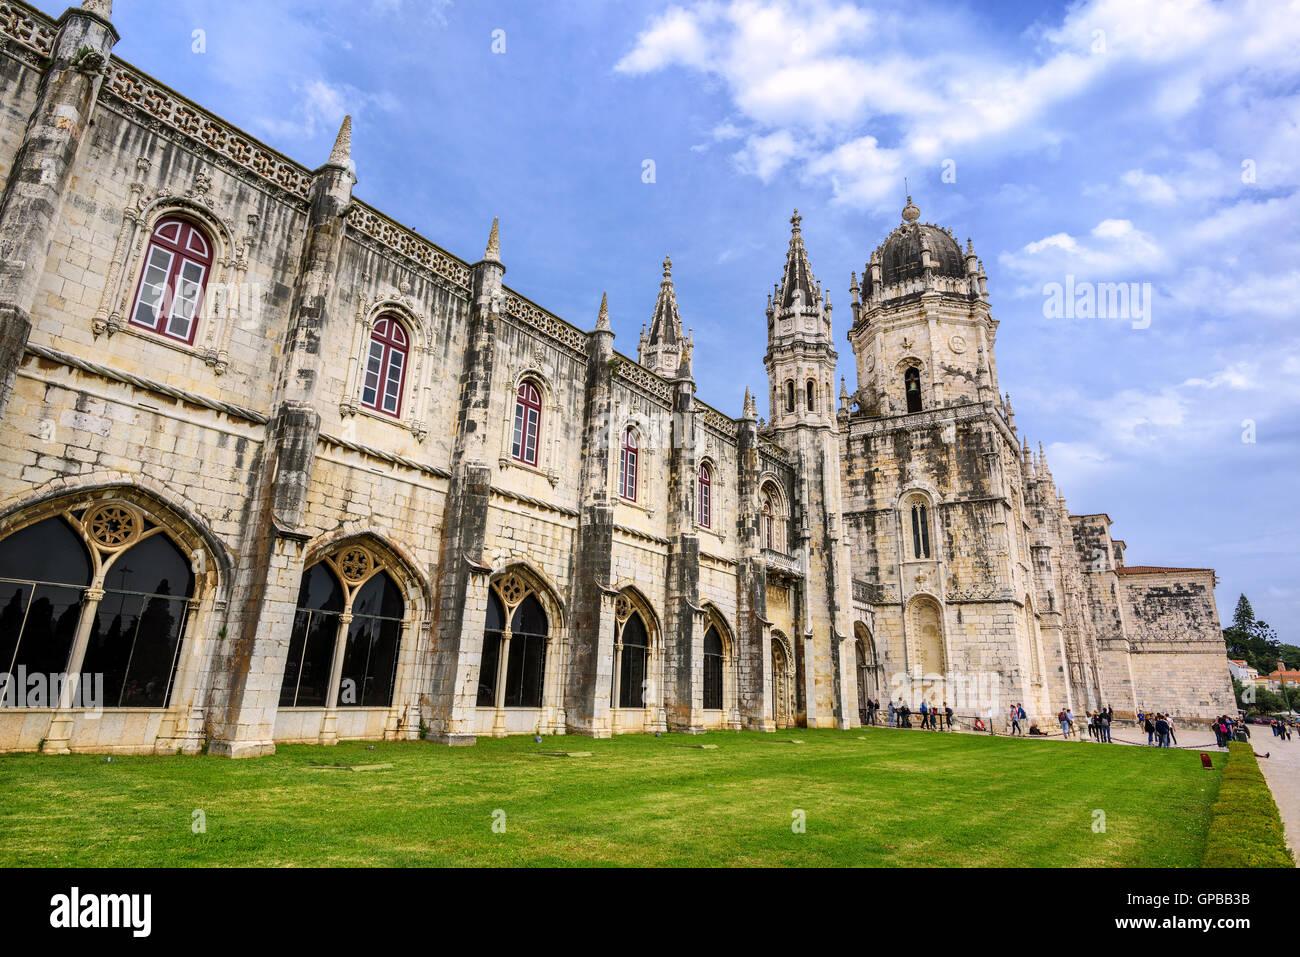 Monastery dos Jeronimos, Lisbon, Portugal - Stock Image